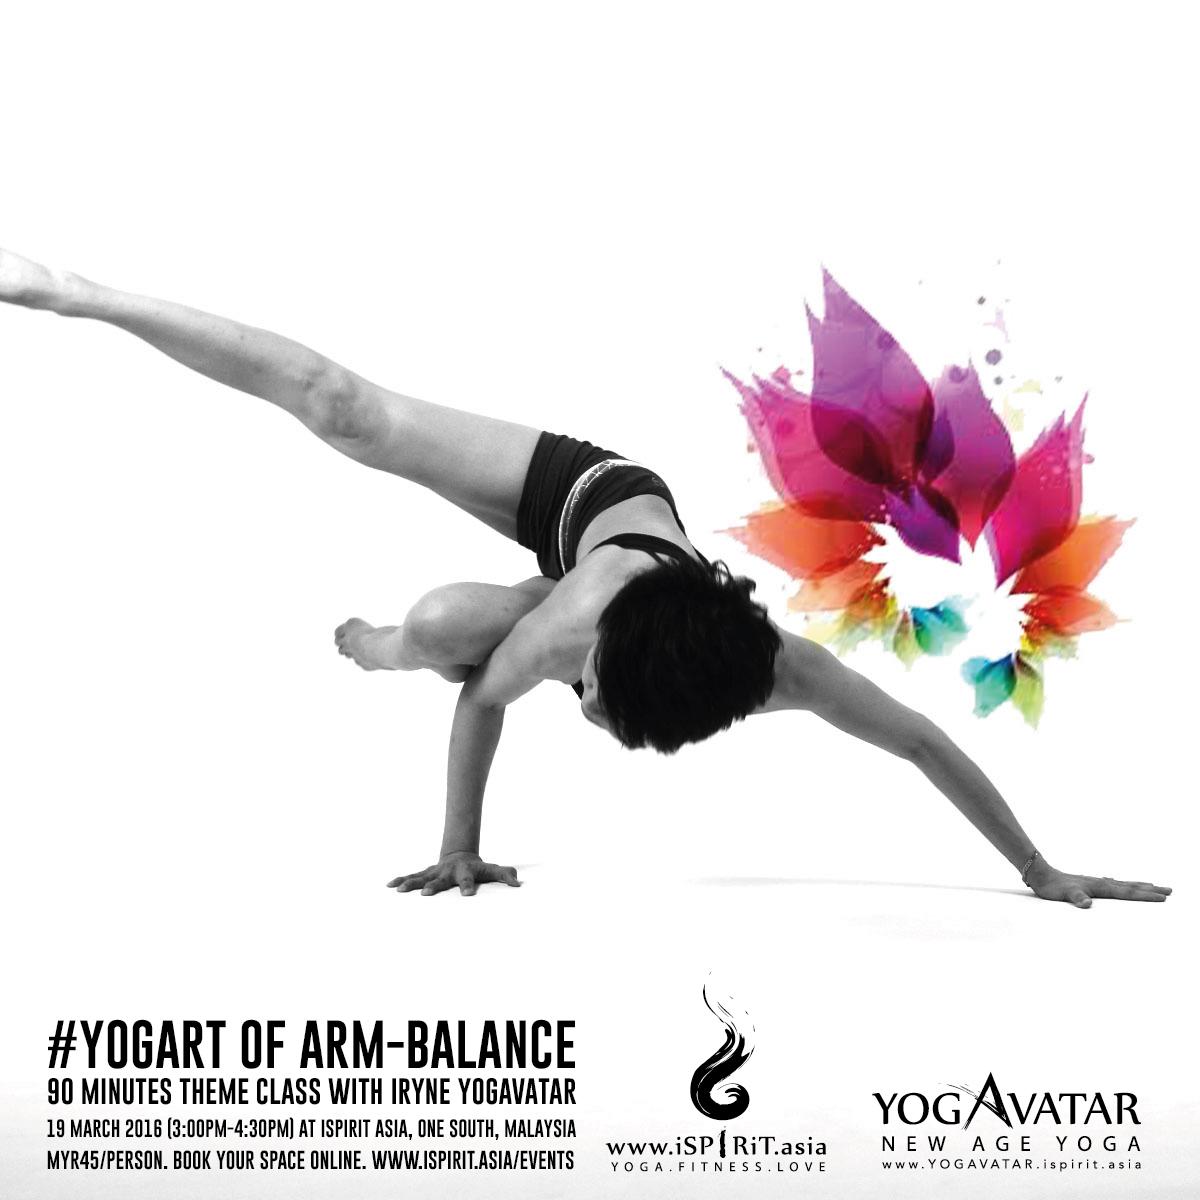 YOGART of Arm Balance with iRyne Yogavatar